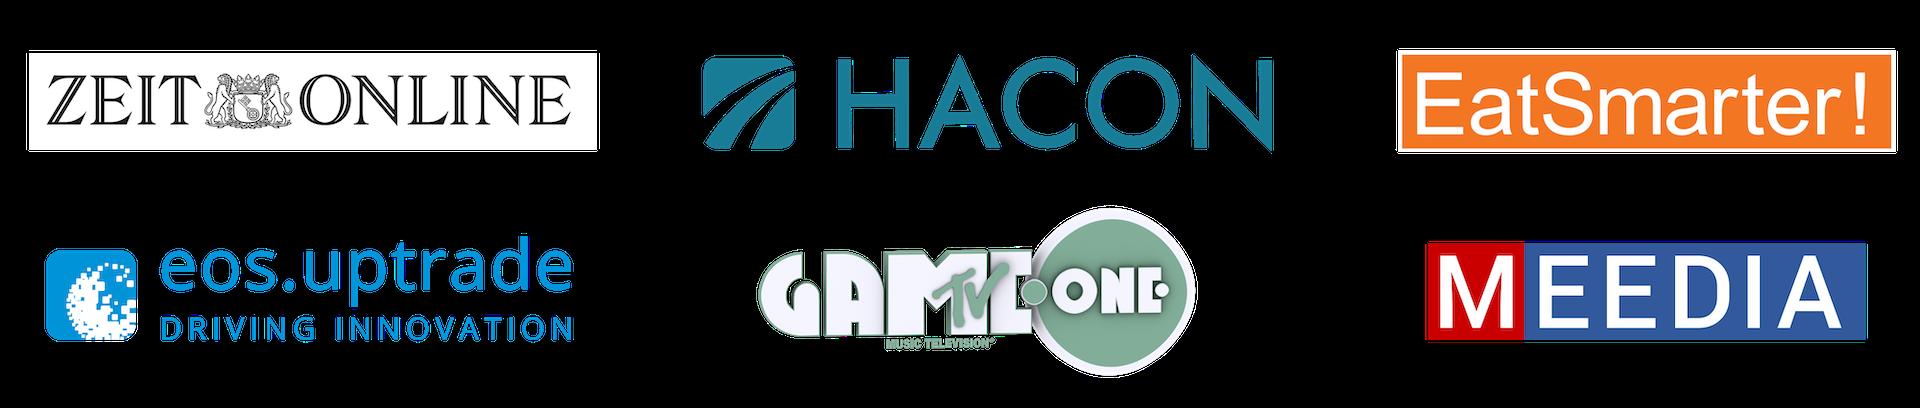 ZEIT ONLINE, HaCon - A Siemens Company, EatSmarter!, eos.uptrade und MEEDIA